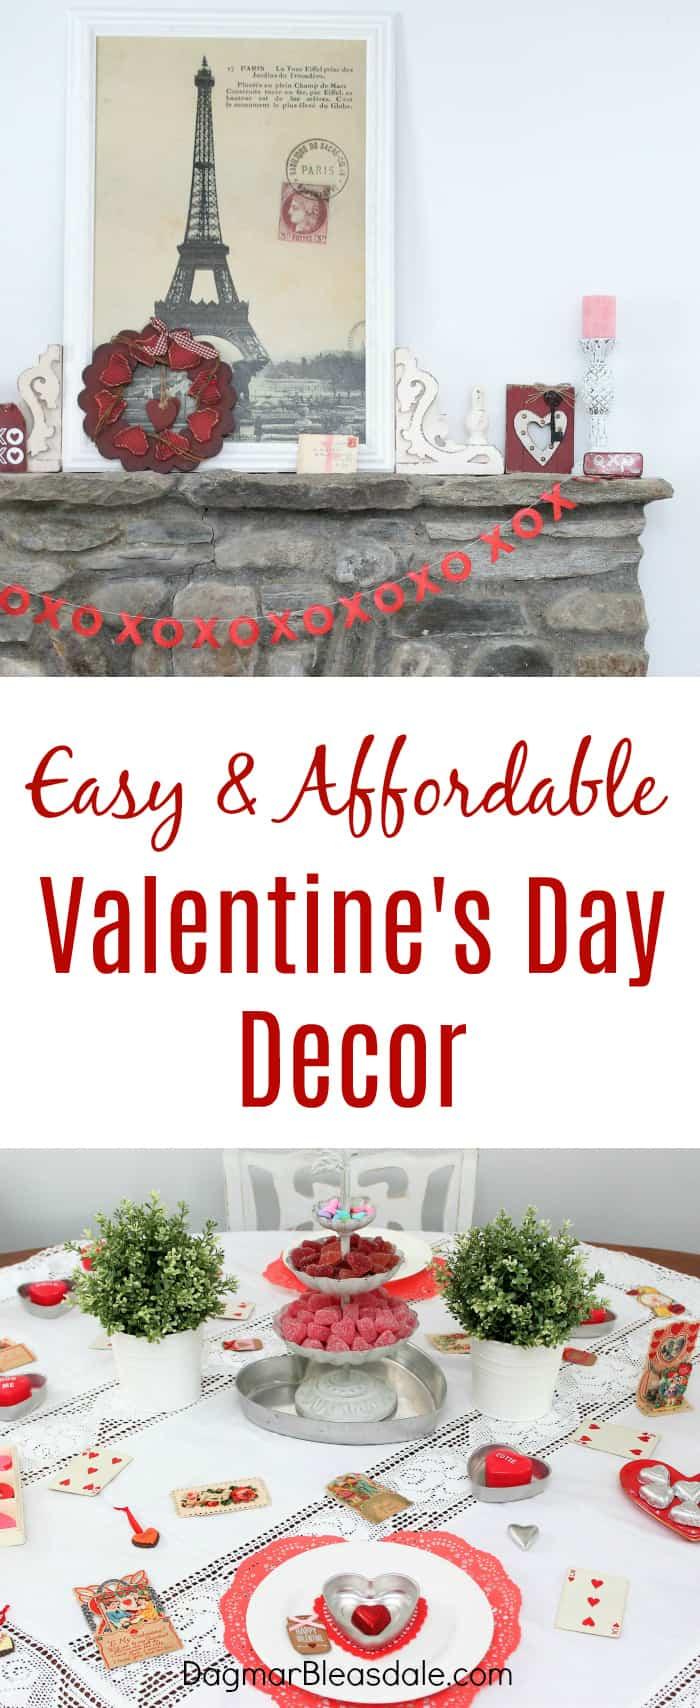 Simple Valentine's Day Decor Ideas